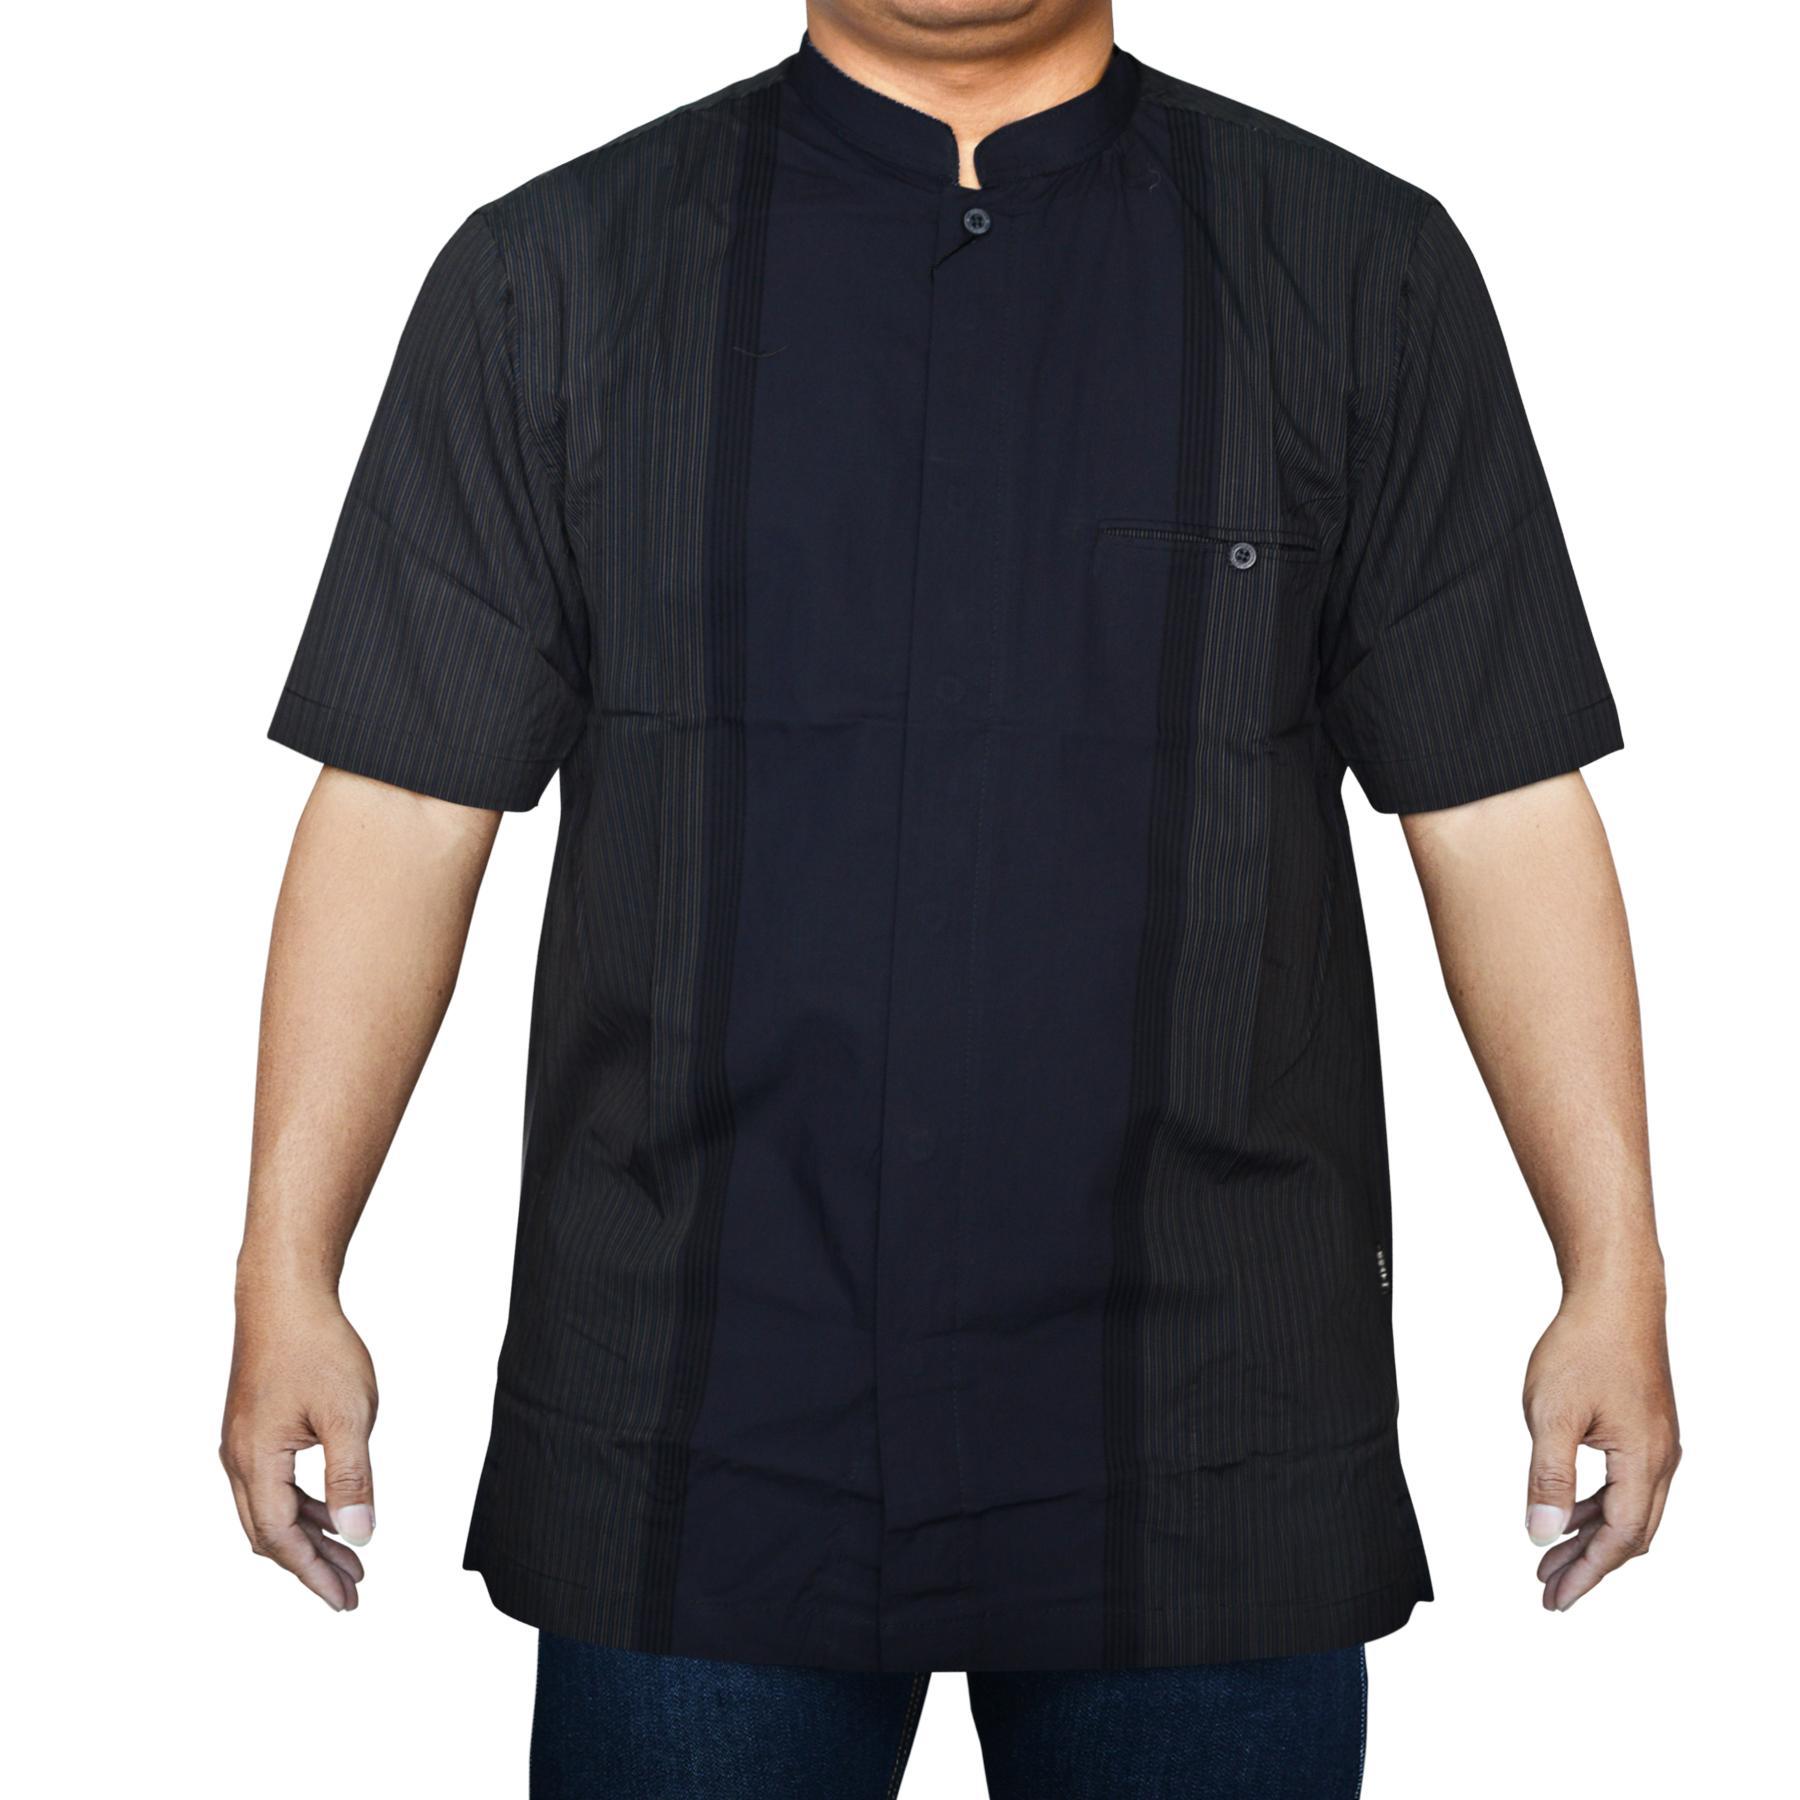 Spesifikasi Isbath Baju Koko Lengan Pendek Kdkc 160403 Navy Terbaik